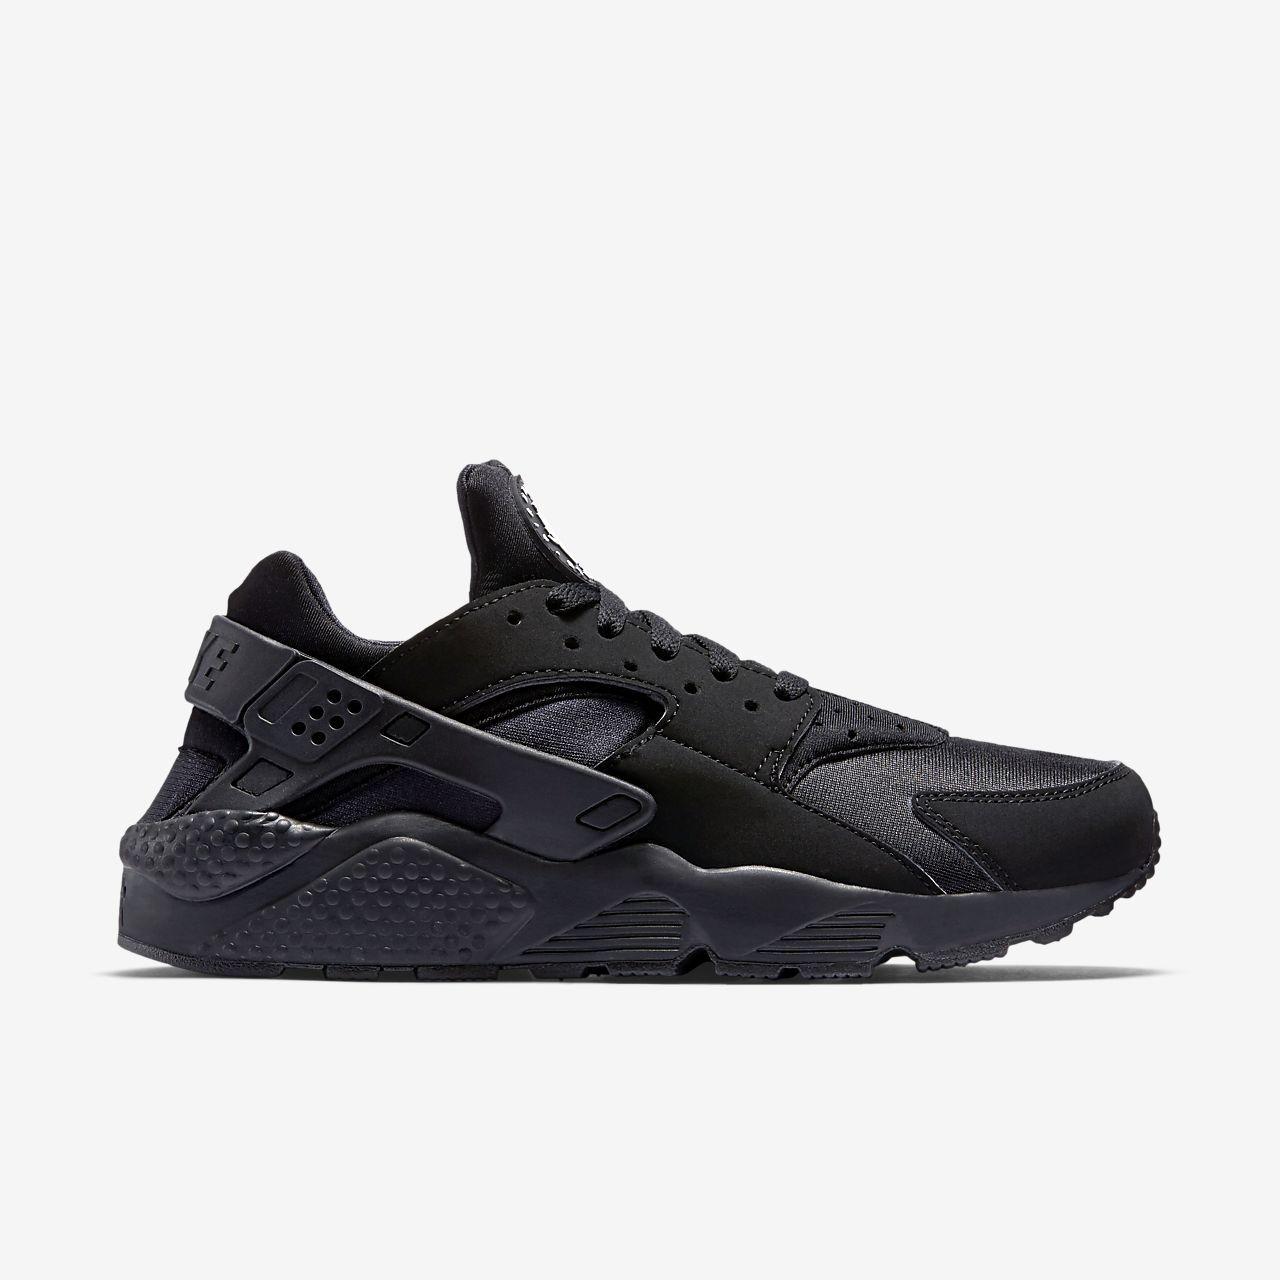 newest 63bd3 5c37c Nike Air Huarache Men s Shoe. Nike Air Huarache Men s Shoe Black Huarache,  Nike Air Huarache, Running Sneakers, Running